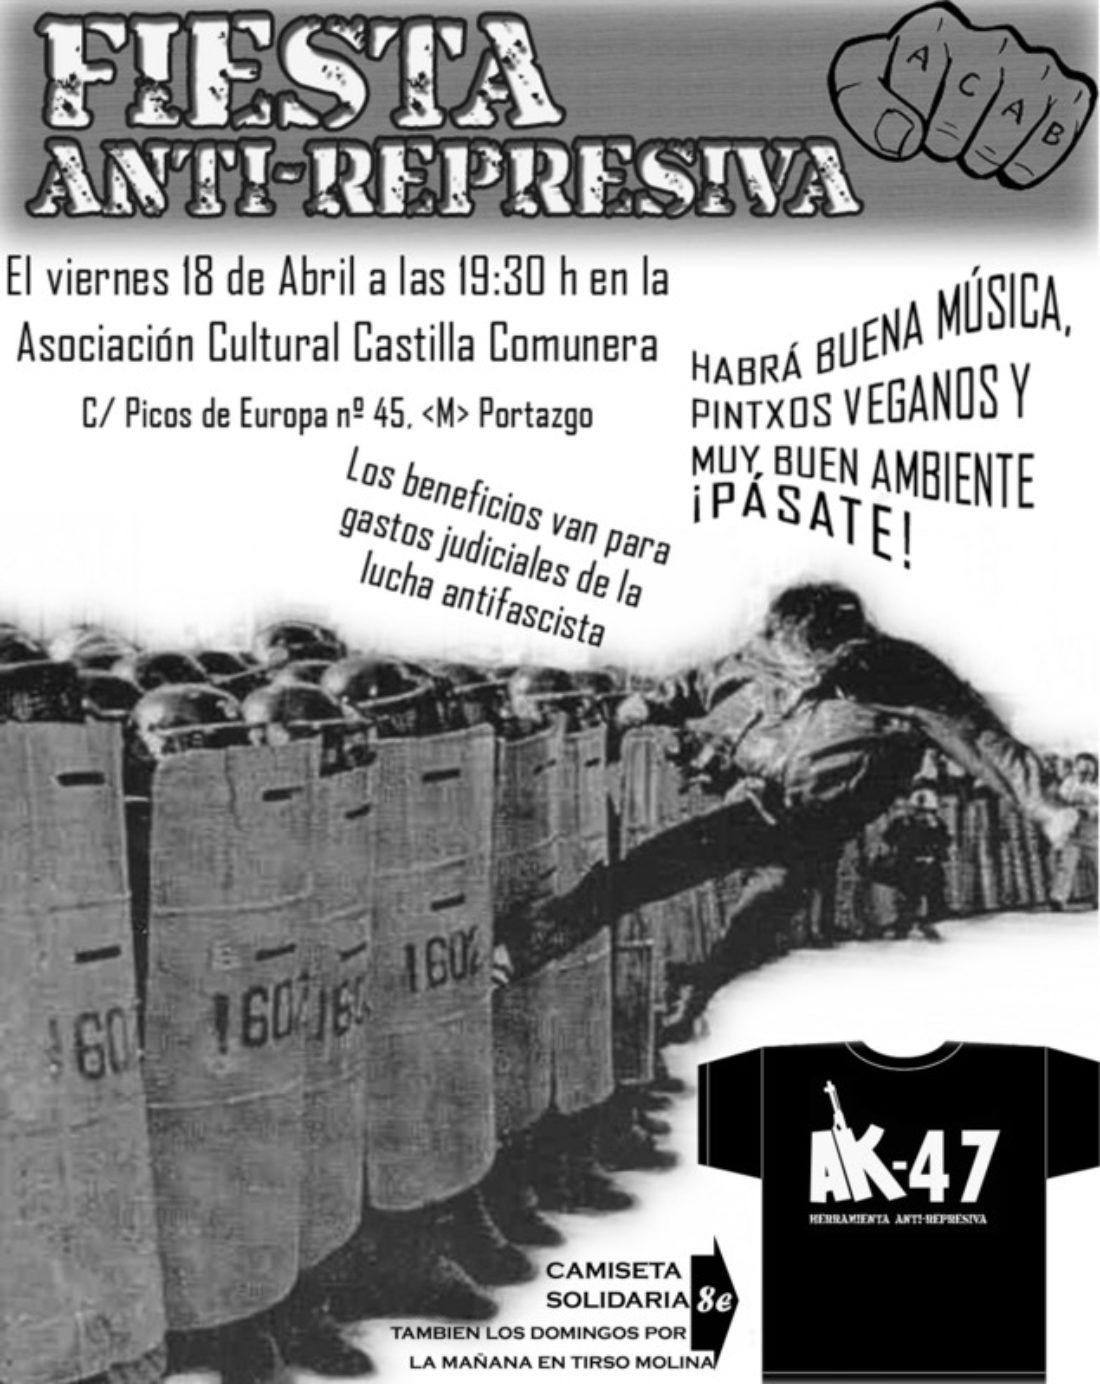 Vallekas, viernes 18 de abril: fiesta antirrepresiva